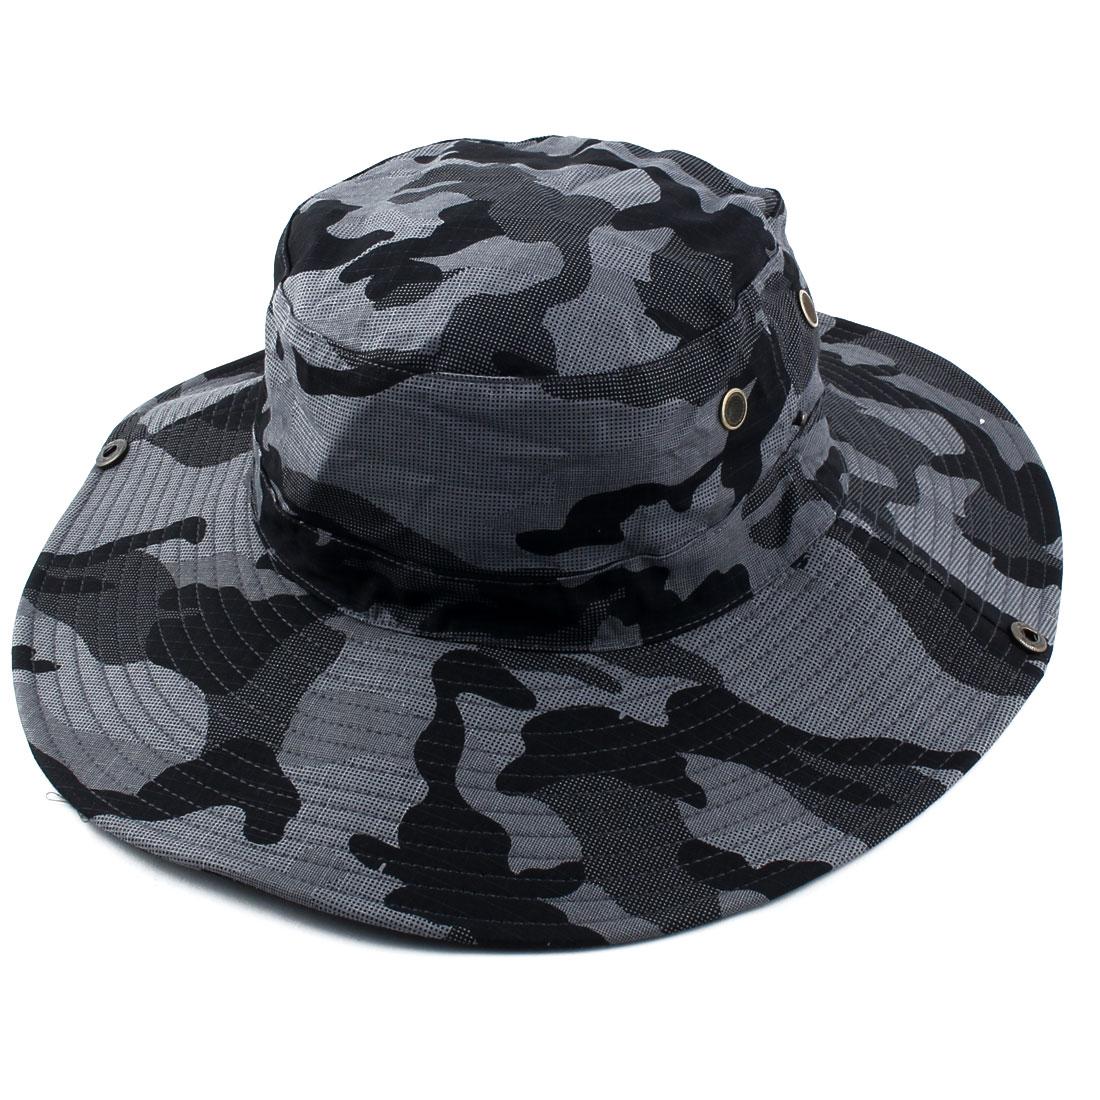 Fisherman Outdoor Sports Mountaineering Adjustable Strap Wide Brim Protective Bucket Summer Cap Fishing Hat Black Dark Gray